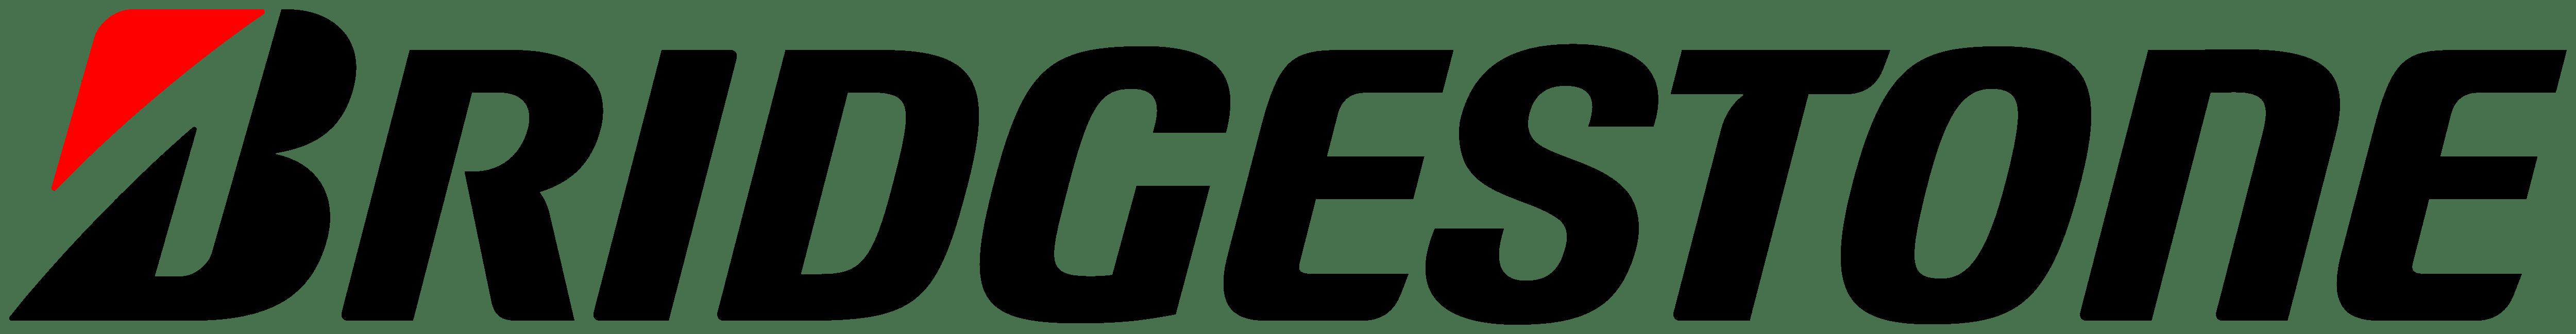 Logo Bridgestone PNG transparente - StickPNG